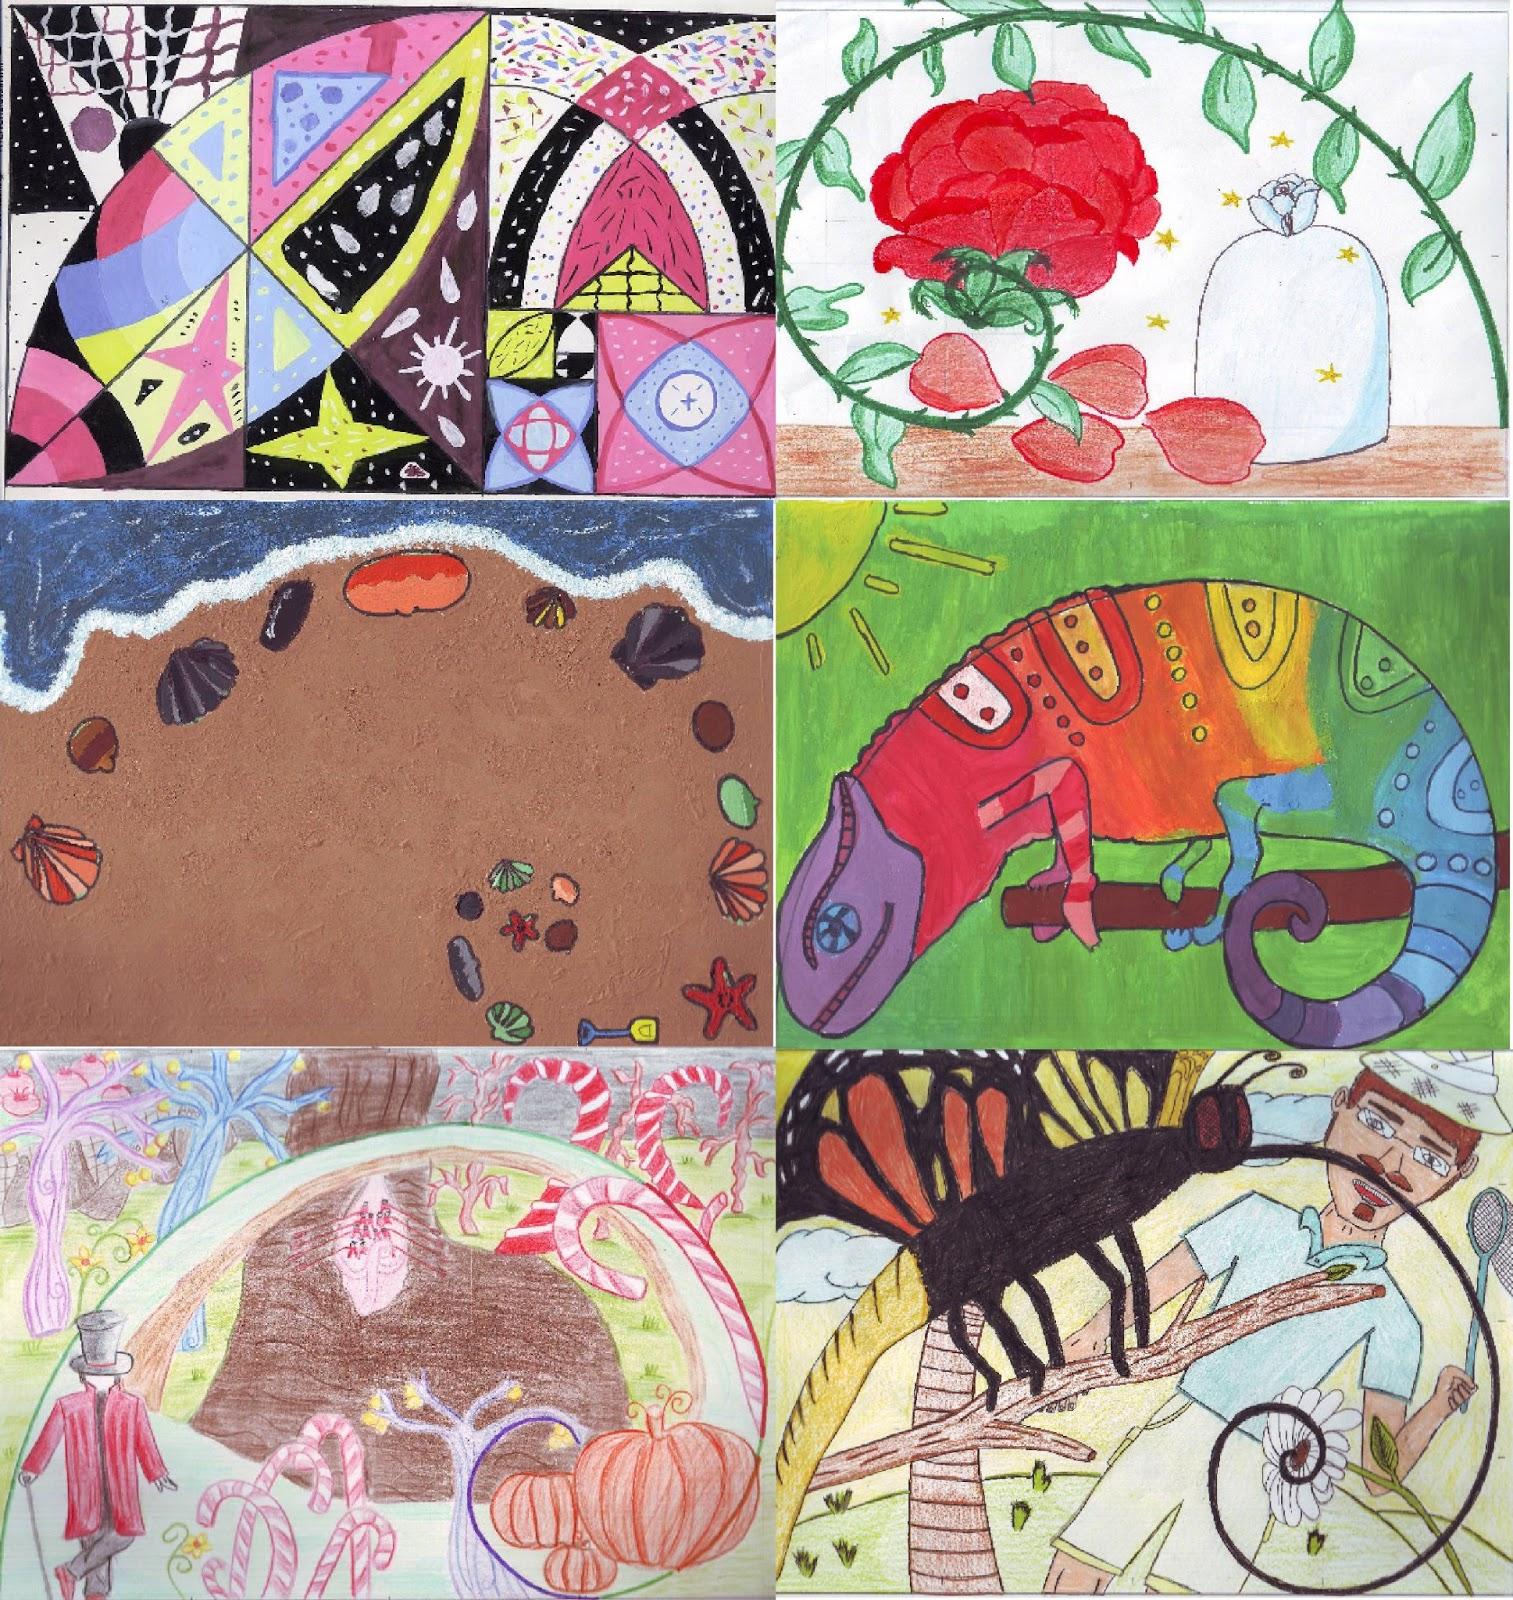 Pintar, crear, pensar...: La espiral áurea